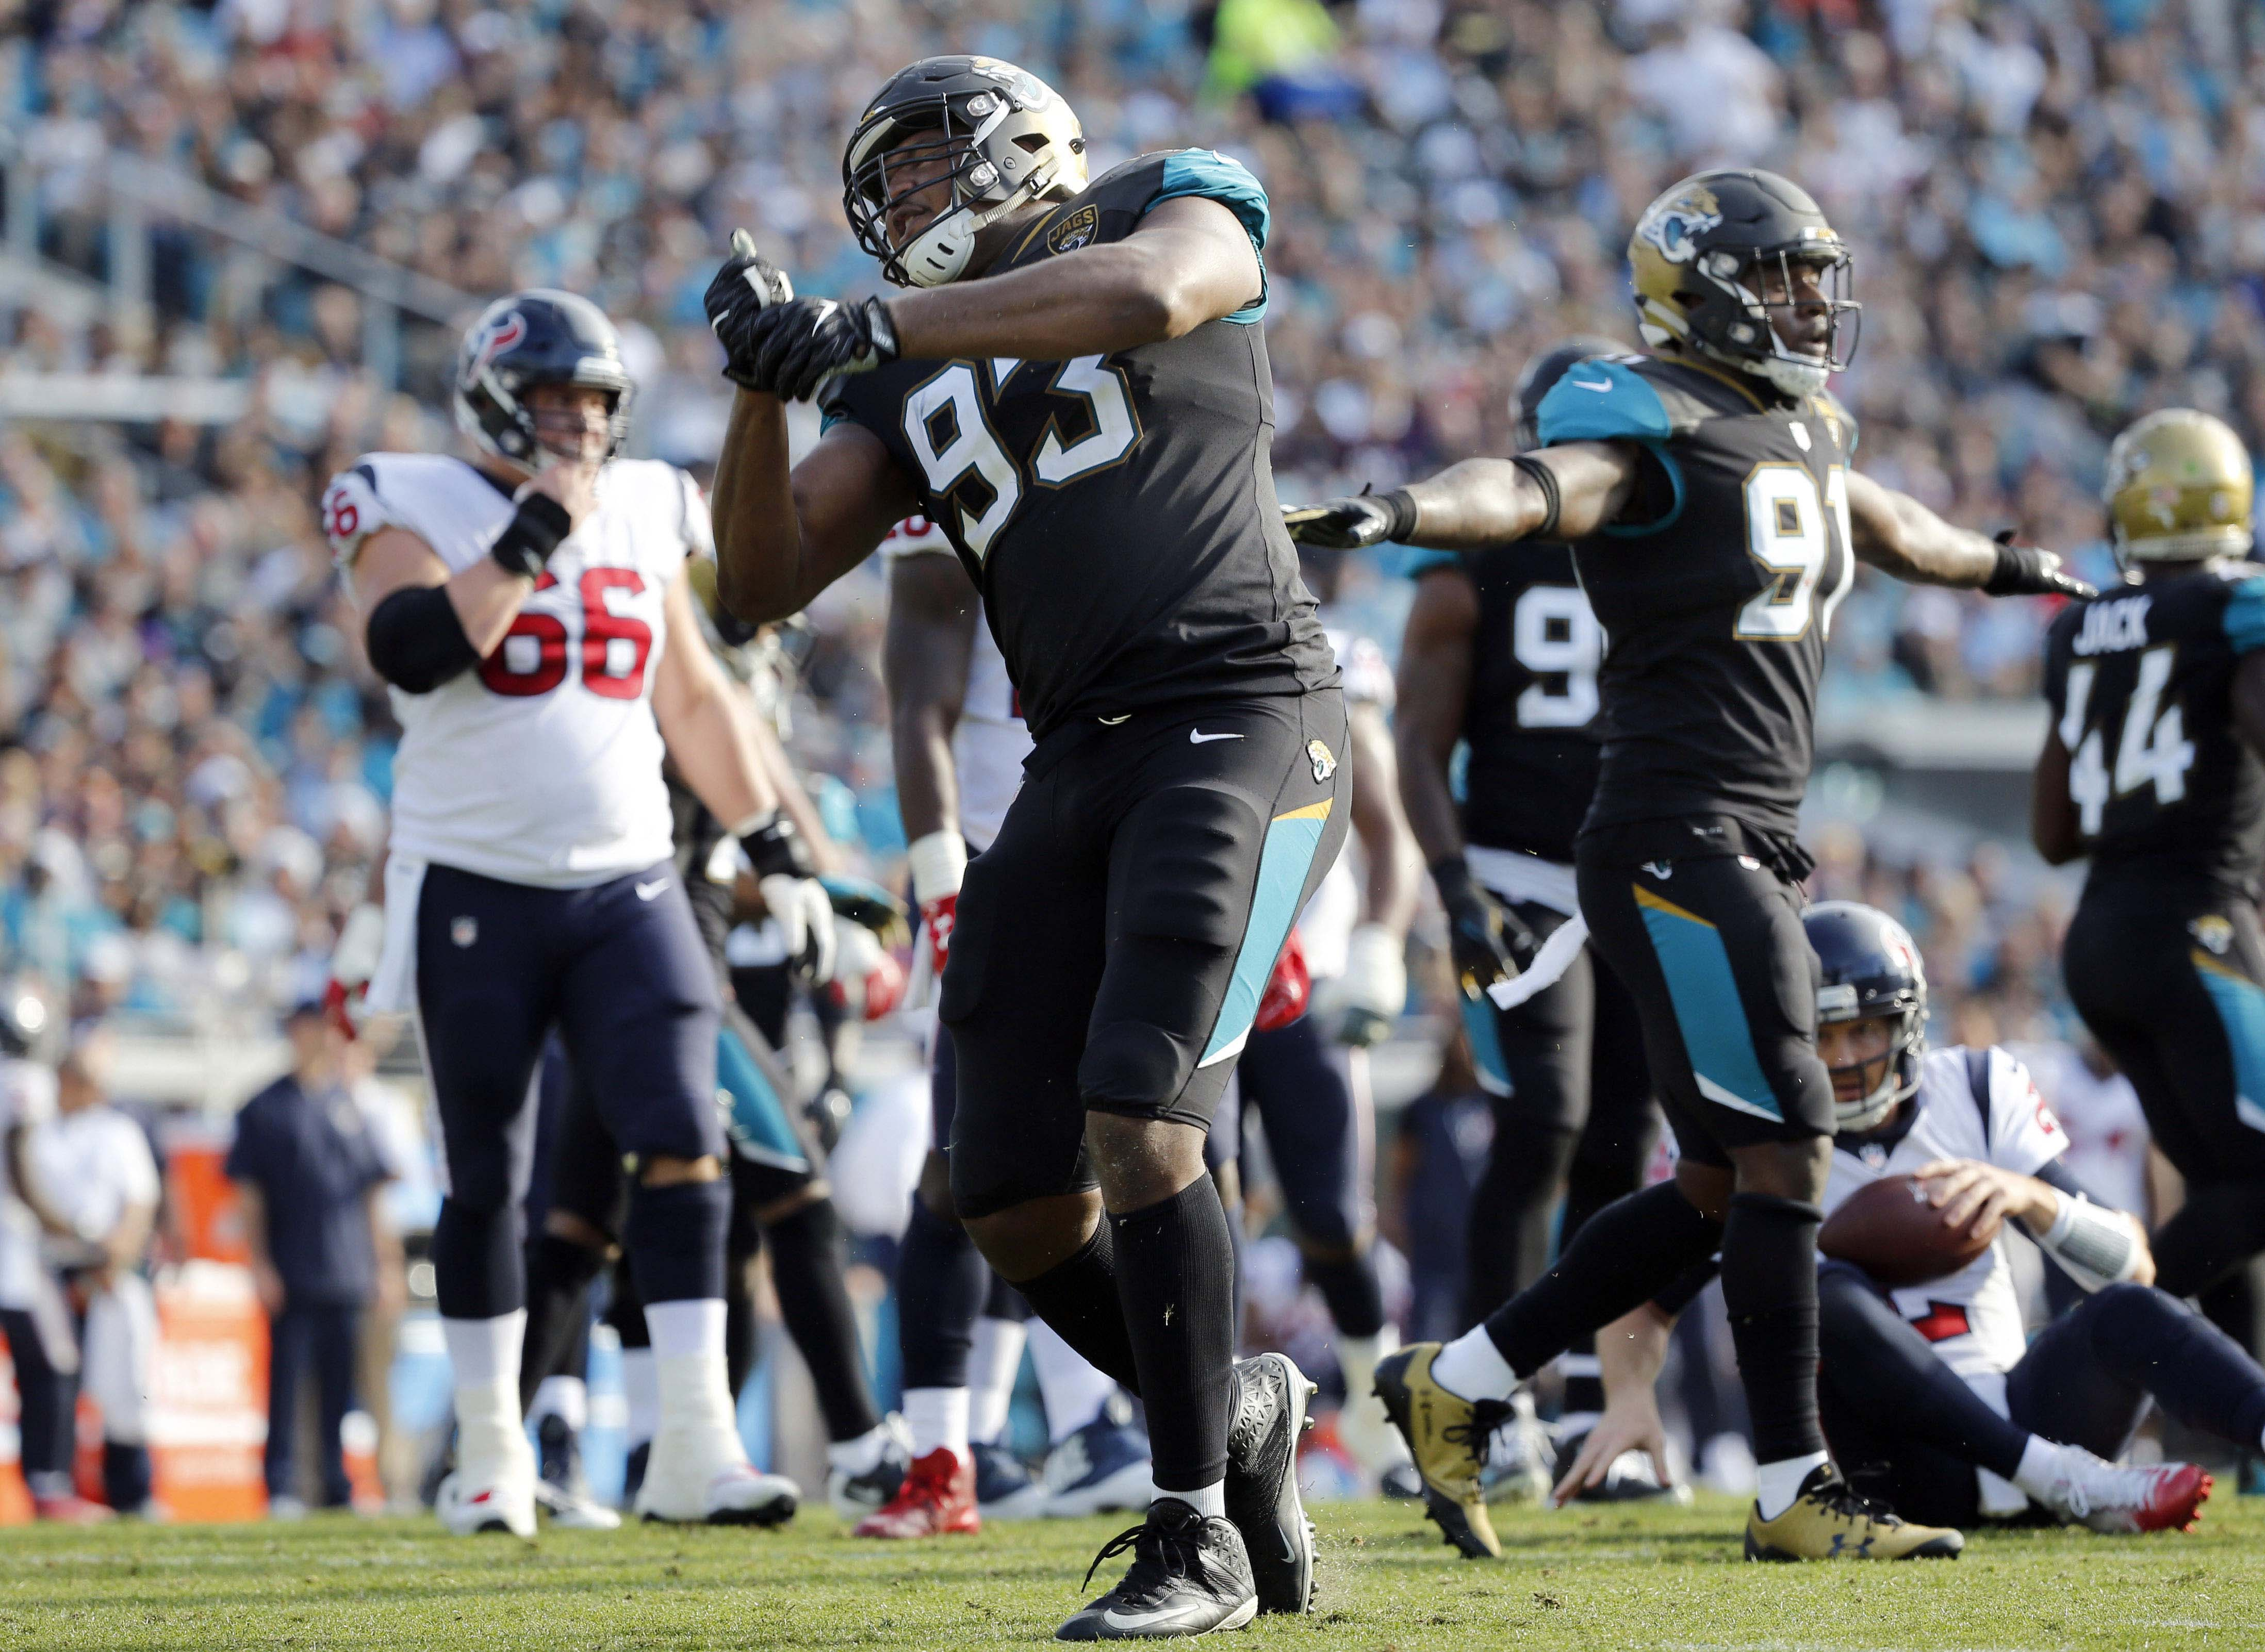 Jacksonville Jaguars RB Leonard Fournette out with quad injury